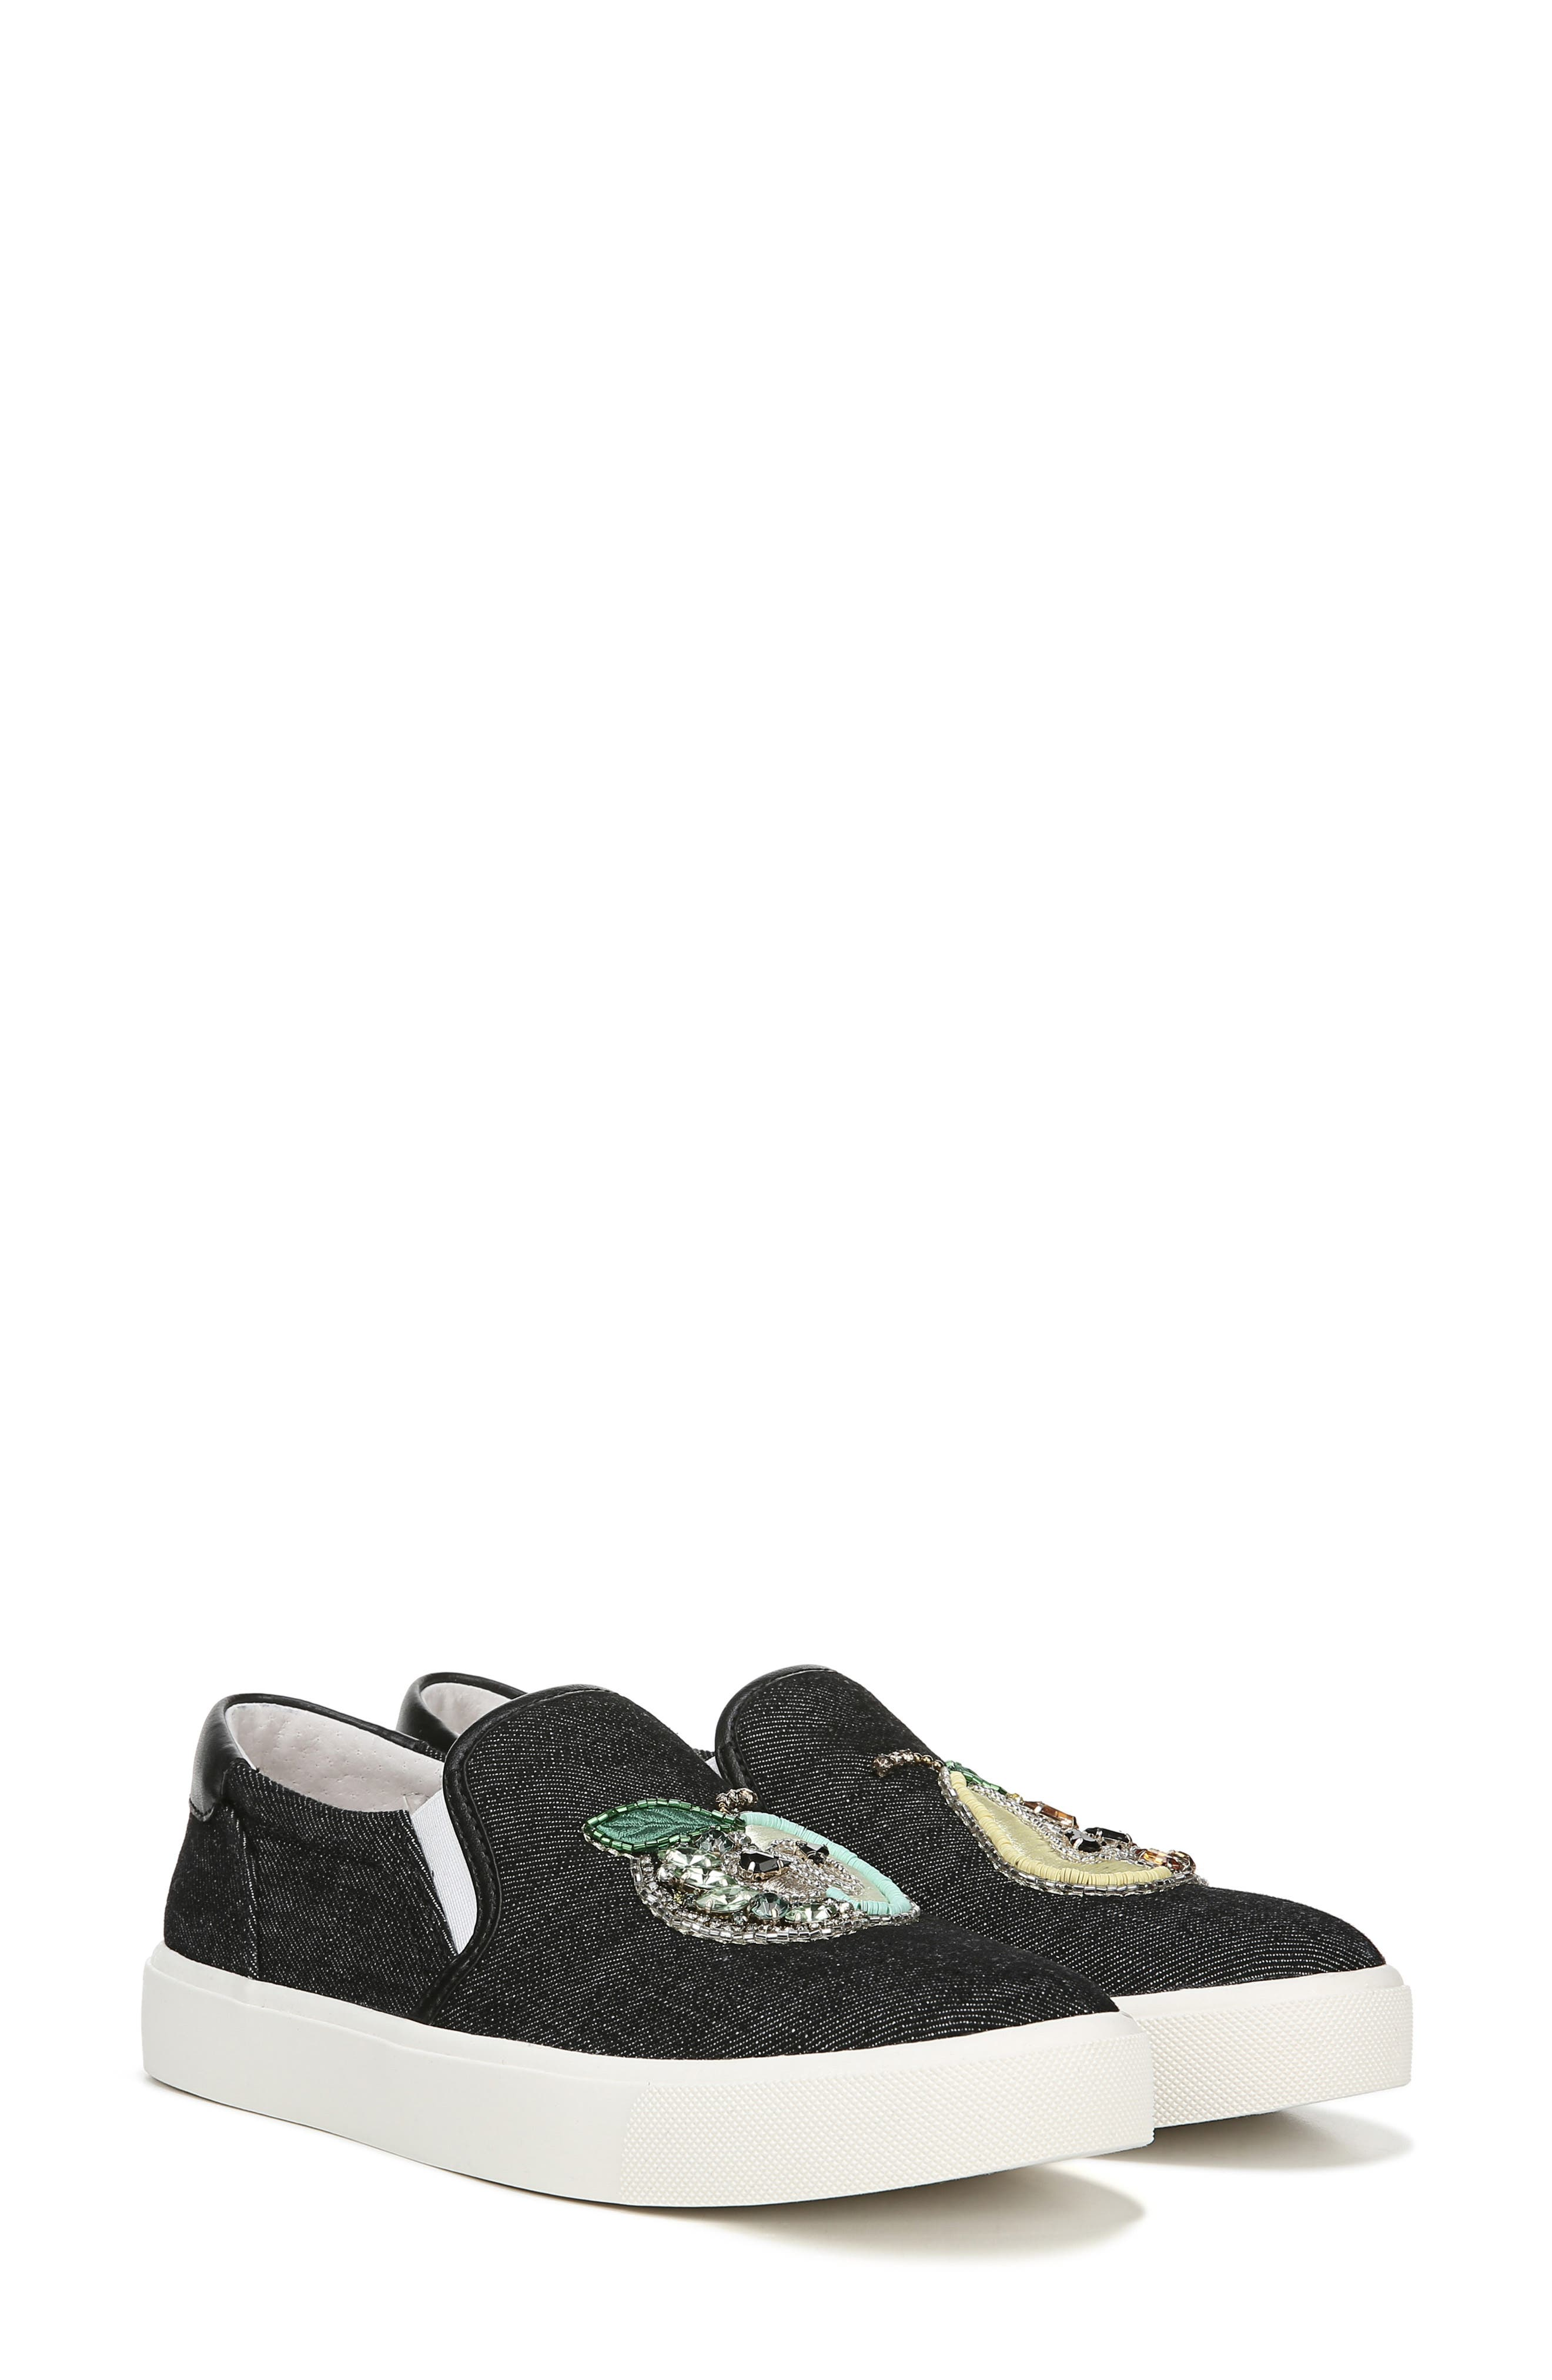 Evelina 5 Slip On Sneaker, Main, color, 001